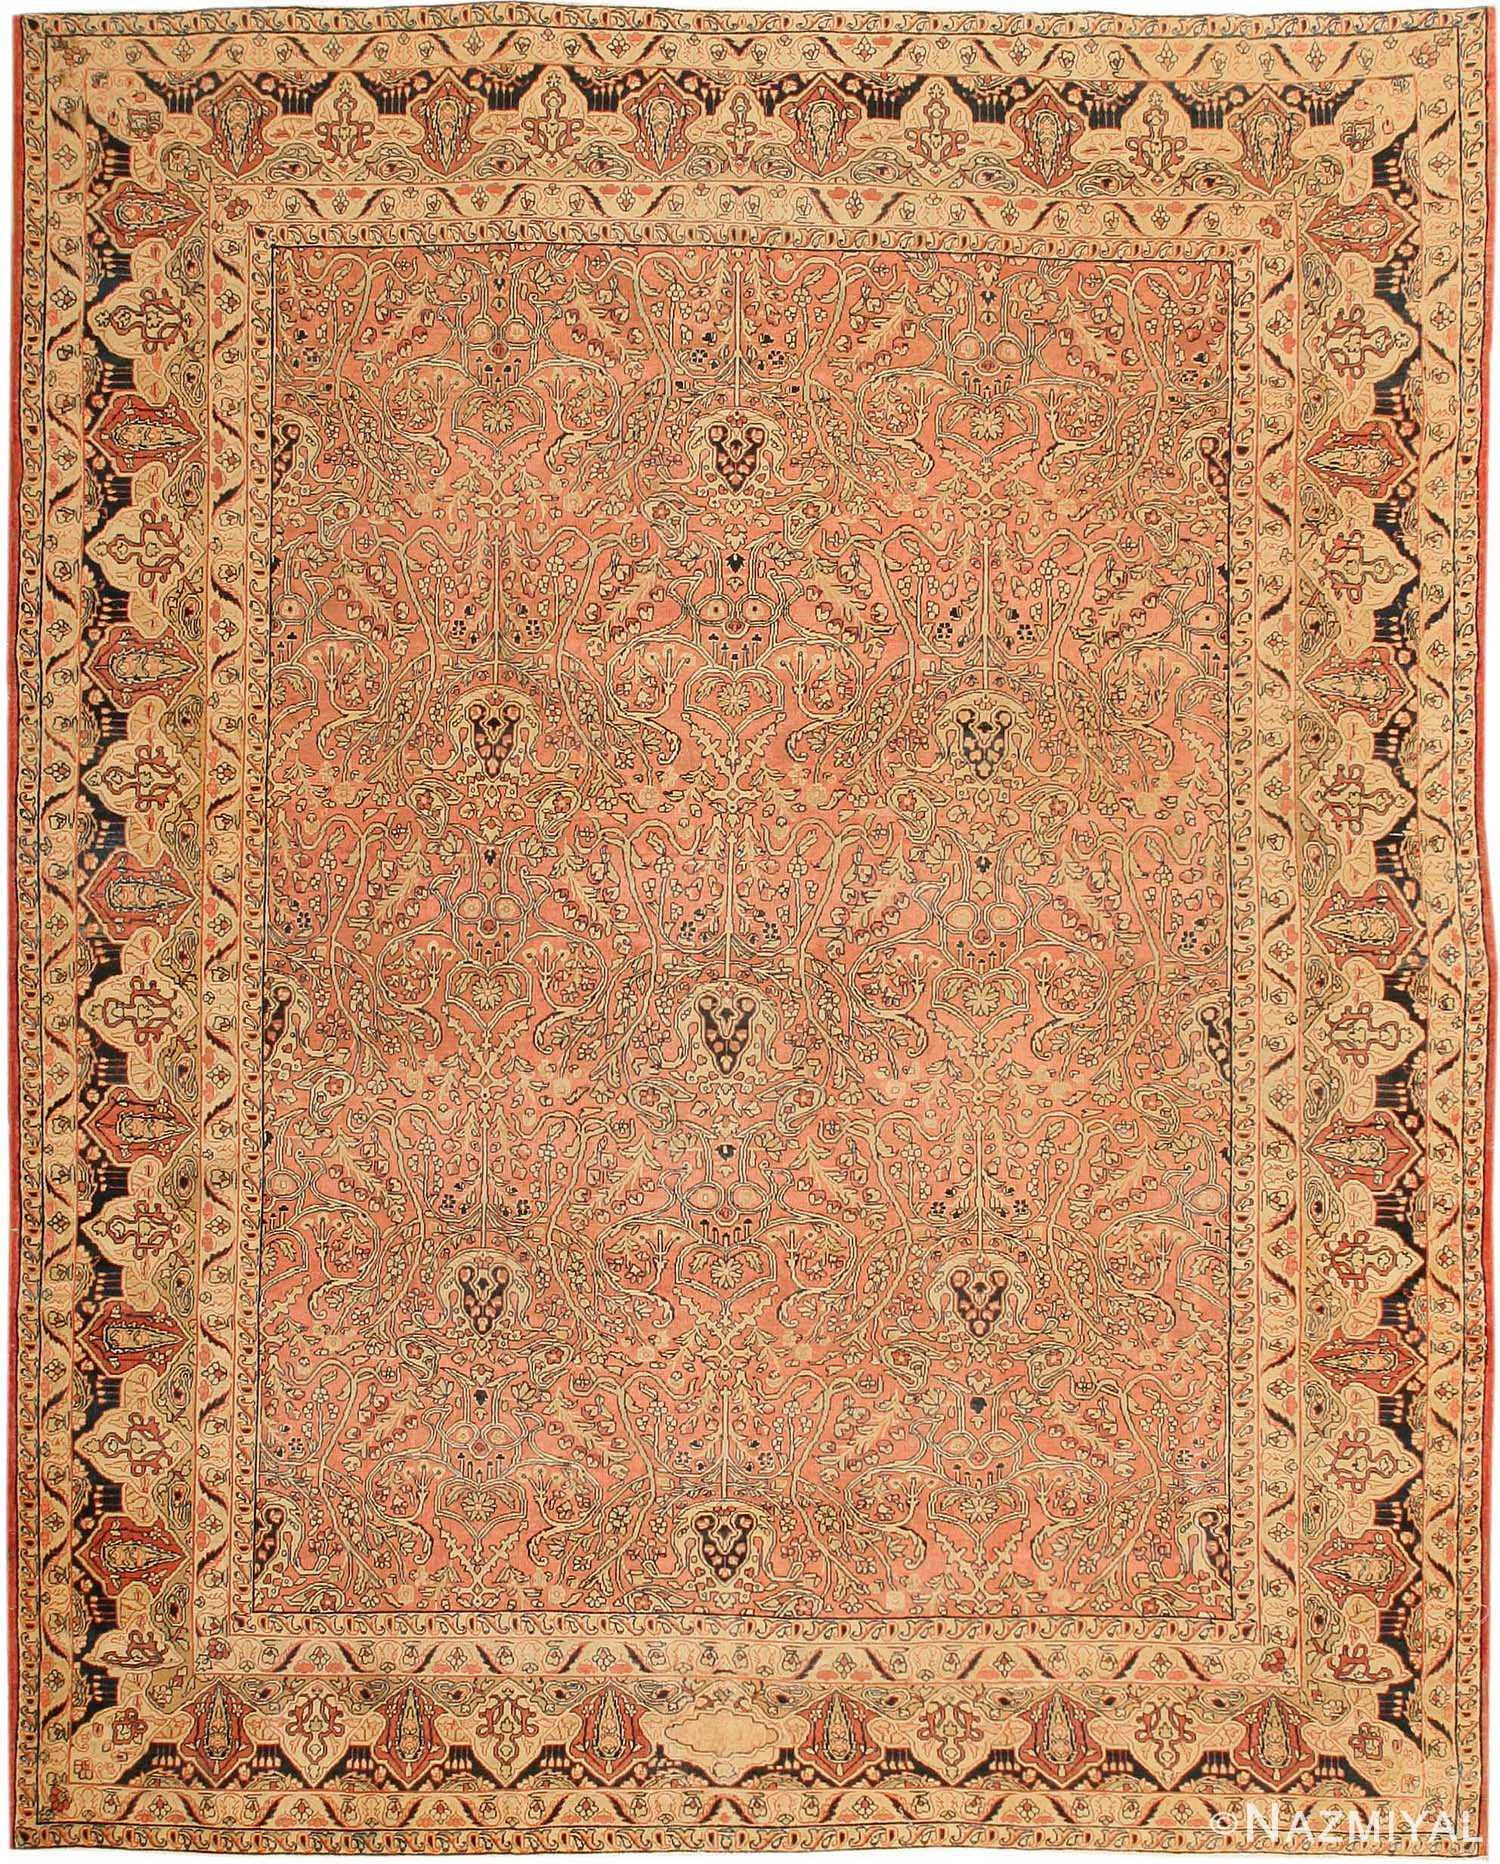 Vintage Persian Rugs: Antique Kerman Persian Rug 43463